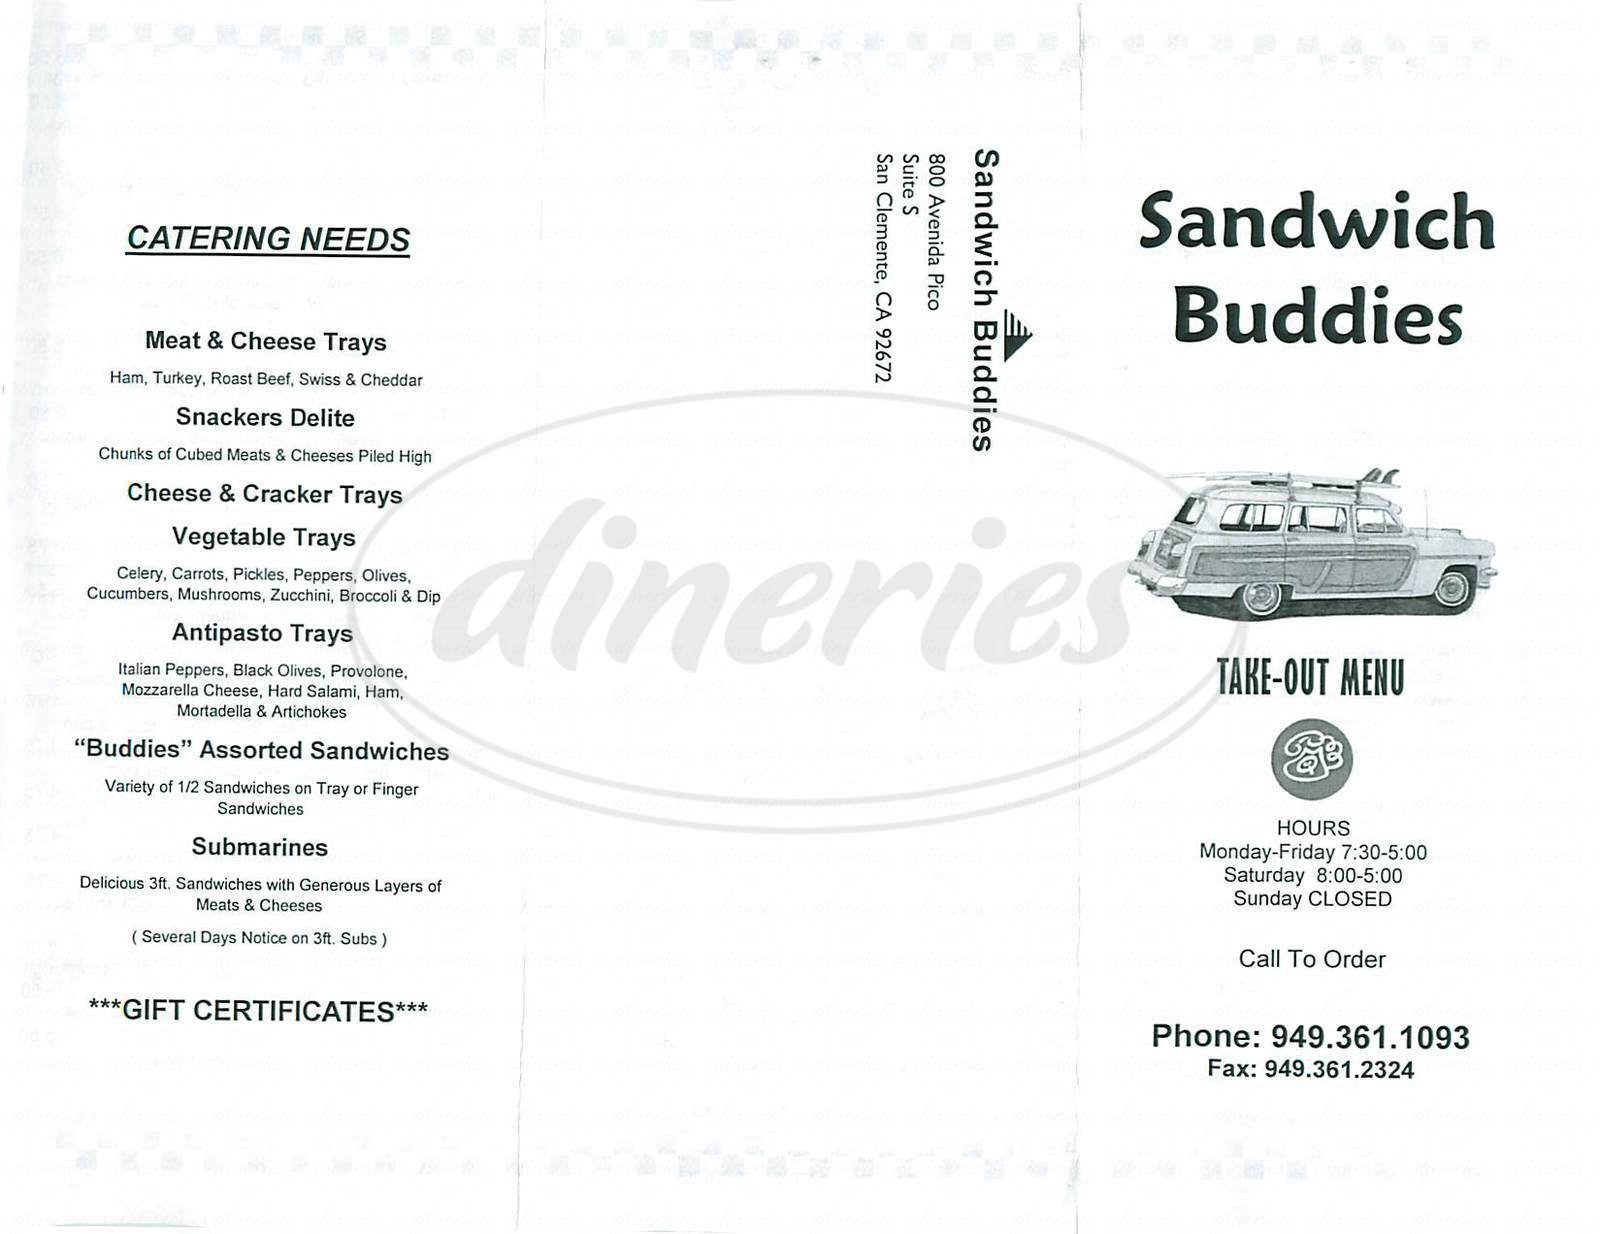 menu for Sandwich Buddies